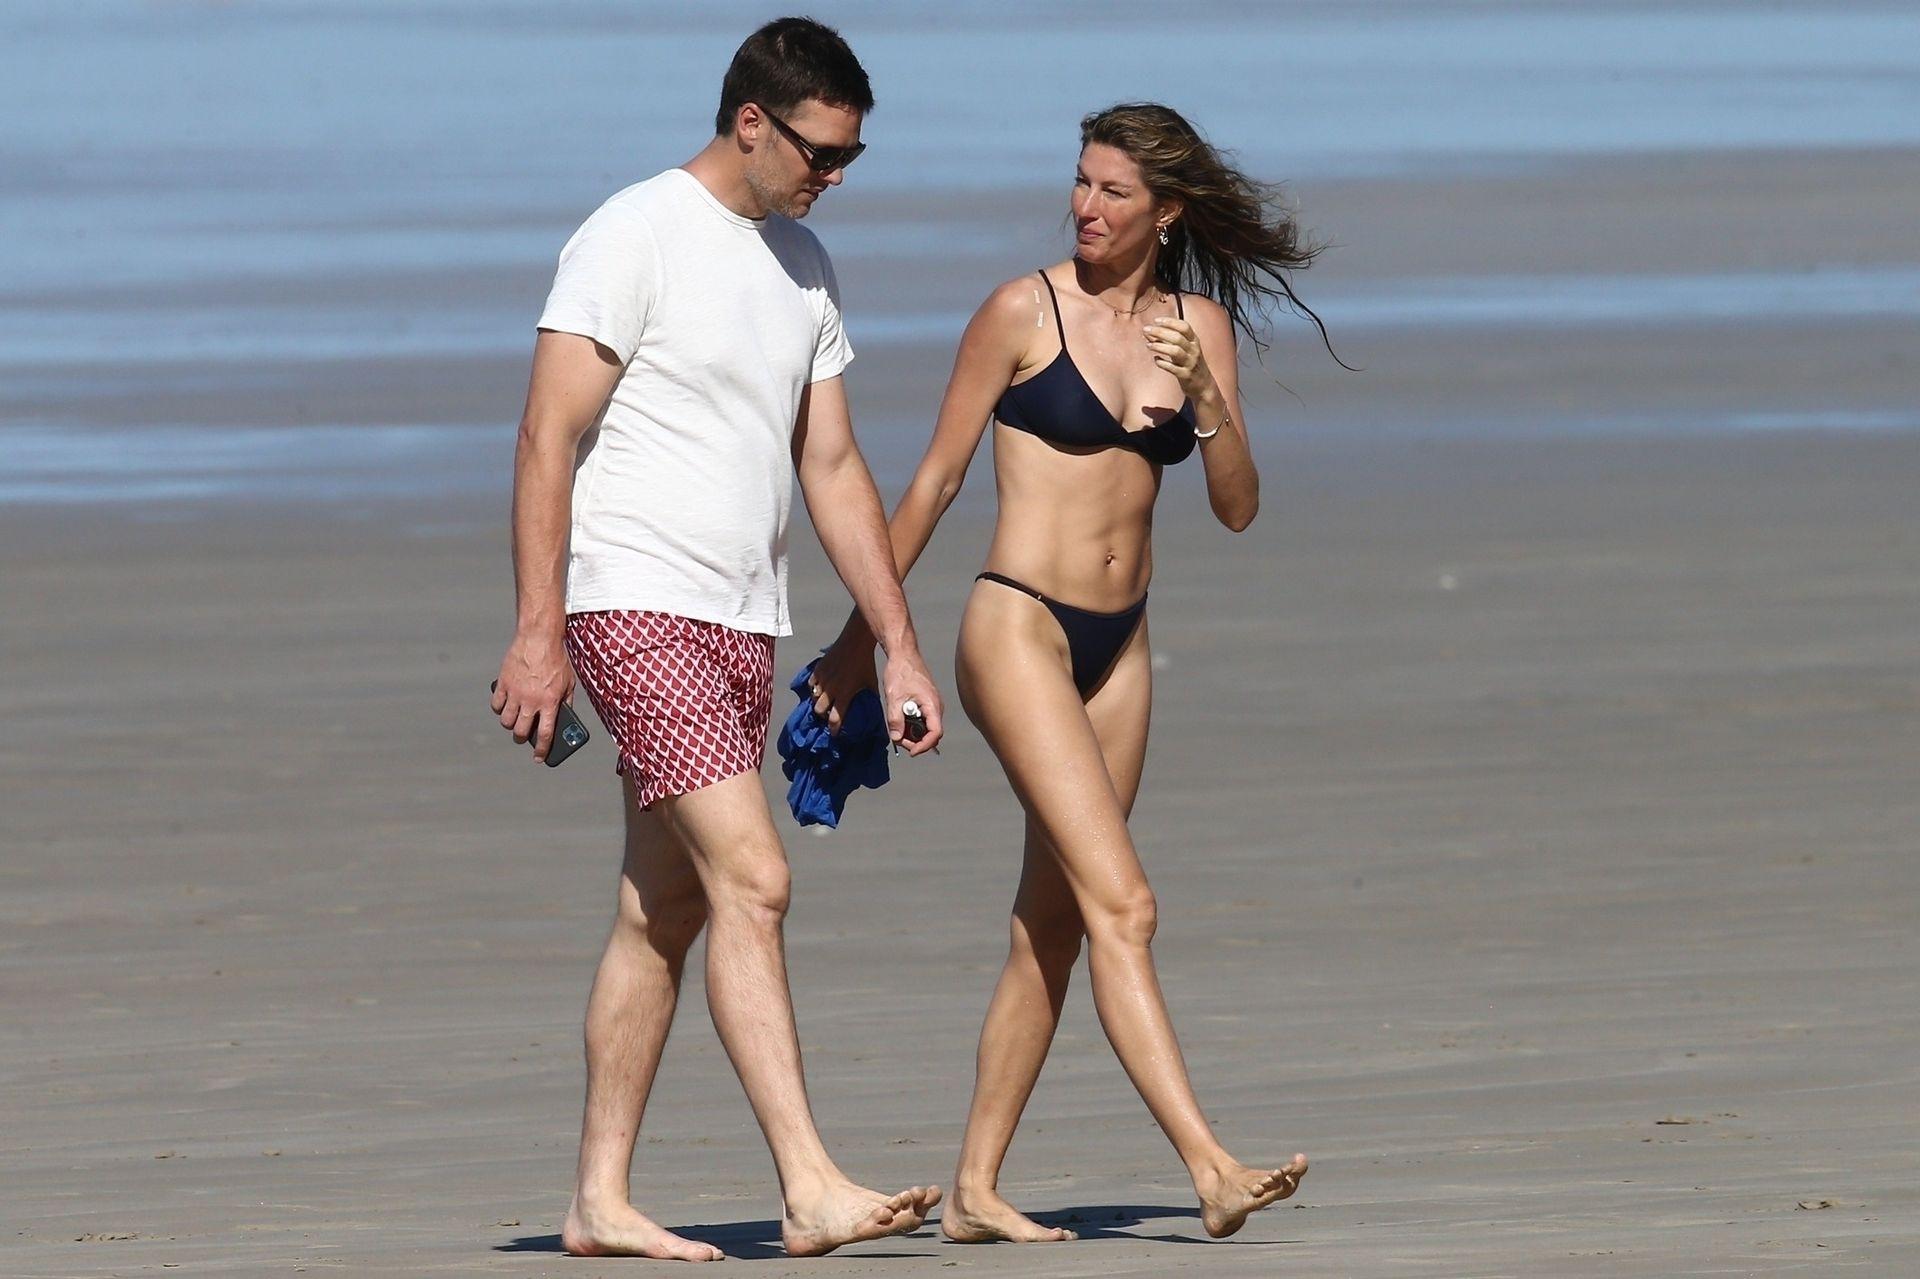 Tom Brady & Gisele Bundchen Pack On The Pda At The Beach 0008